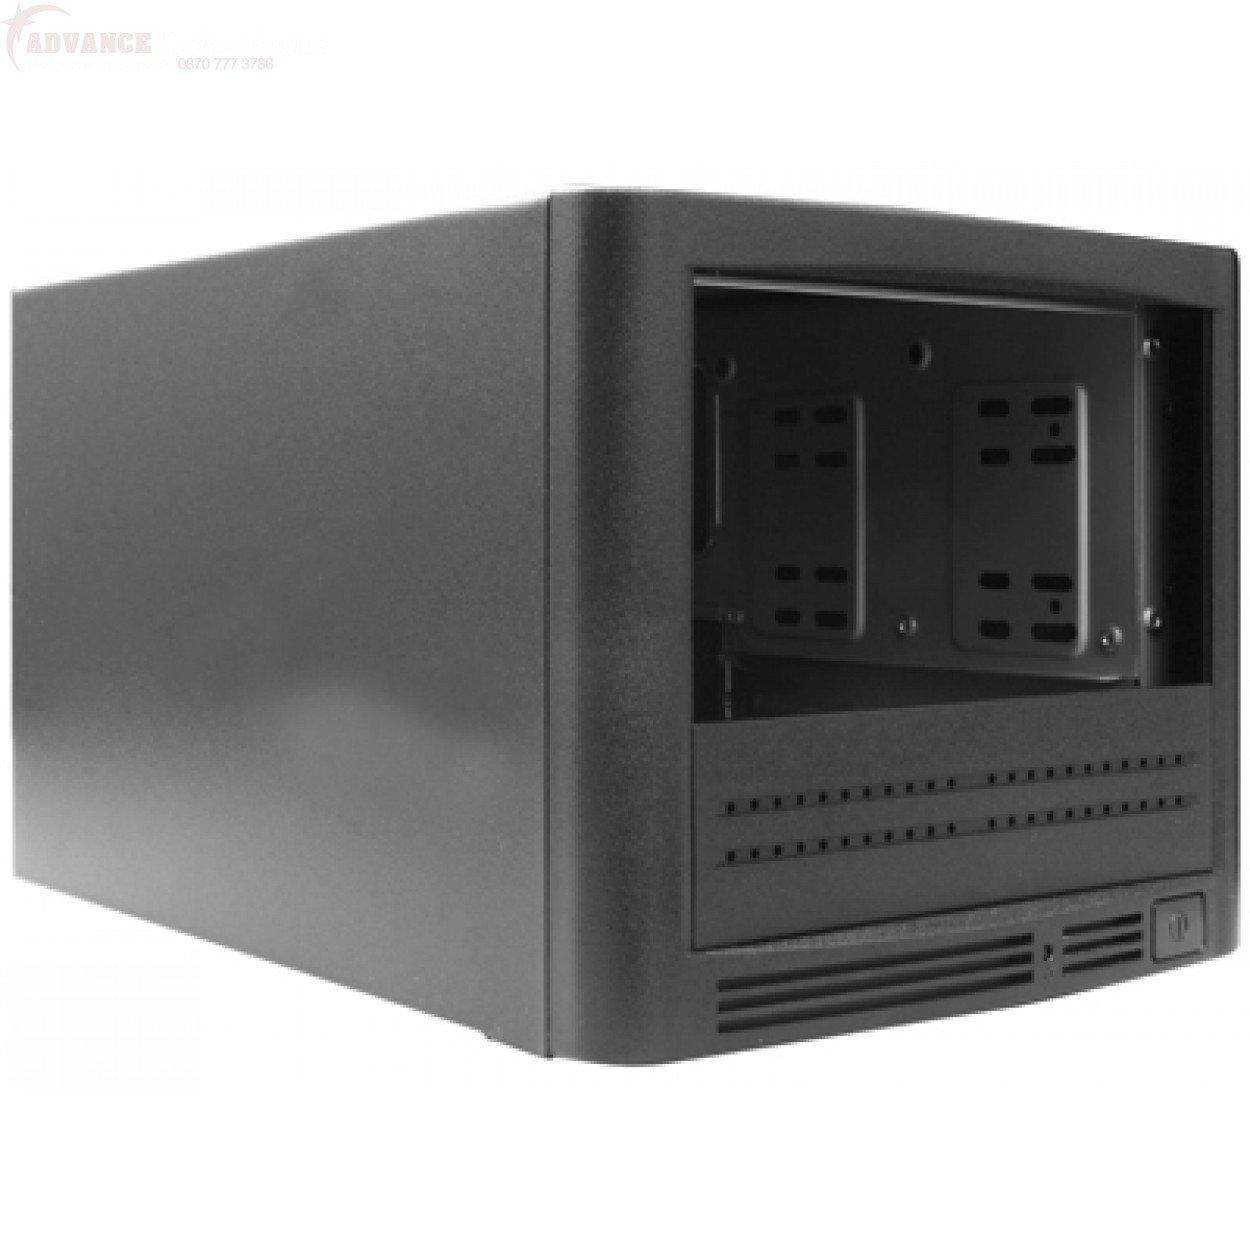 Copystars Duplicator-case 3 Bay for build Blu-ray-CD-dvd-duplicator tower + UL power supply